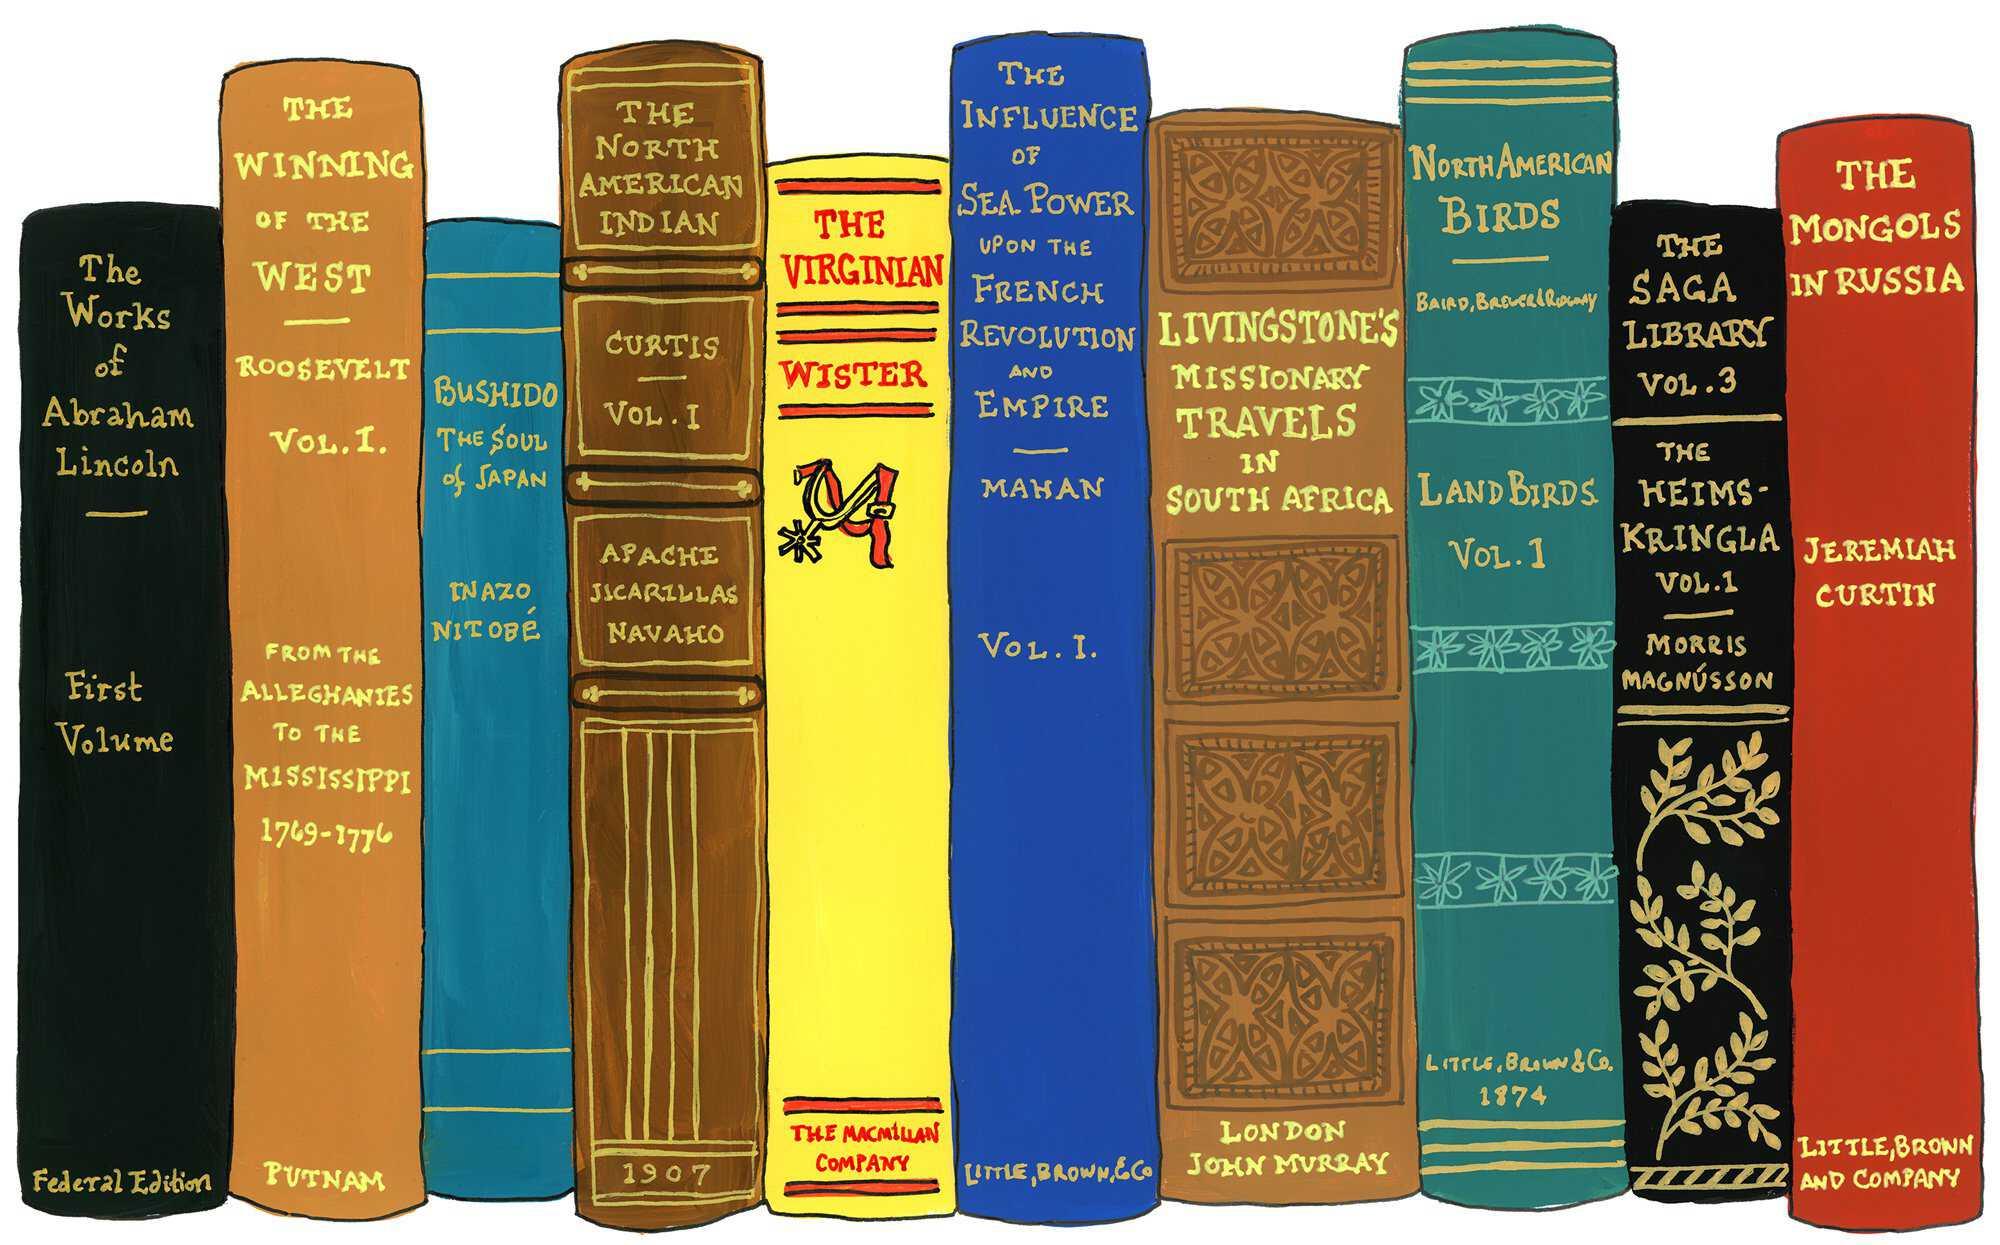 TheodoreRoosevelt-IdealBookshelf-Feature.jpg